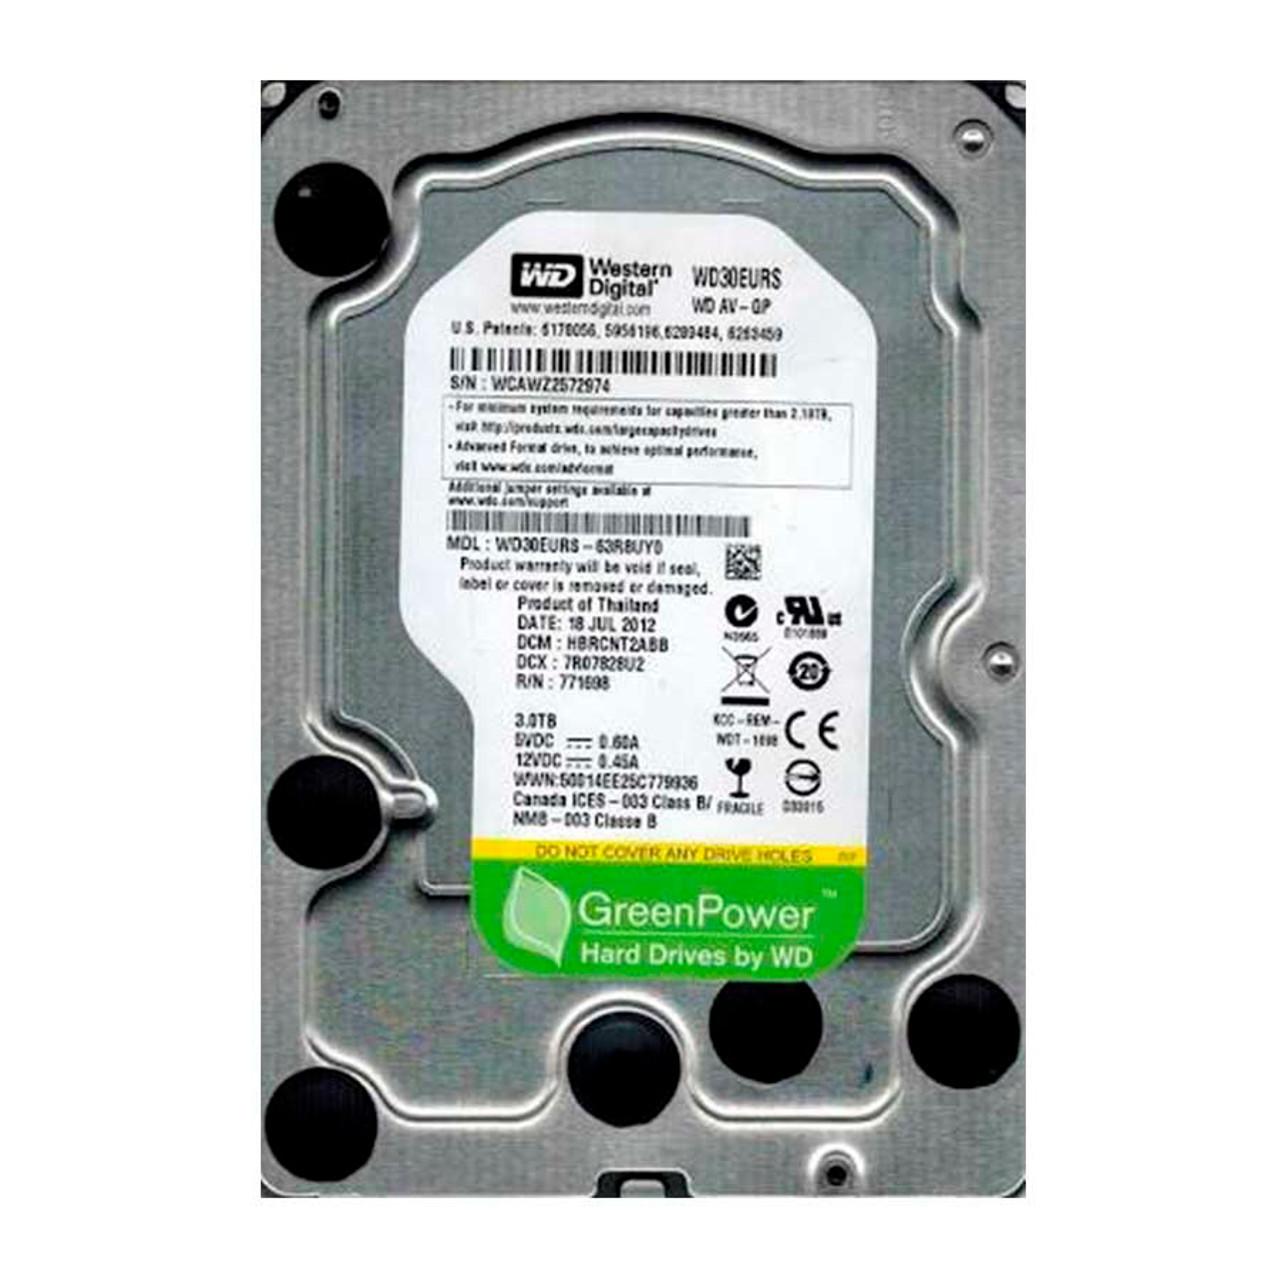 Western Digital WD30EURS AV-GP 3TB HDD Internal Hard Drive